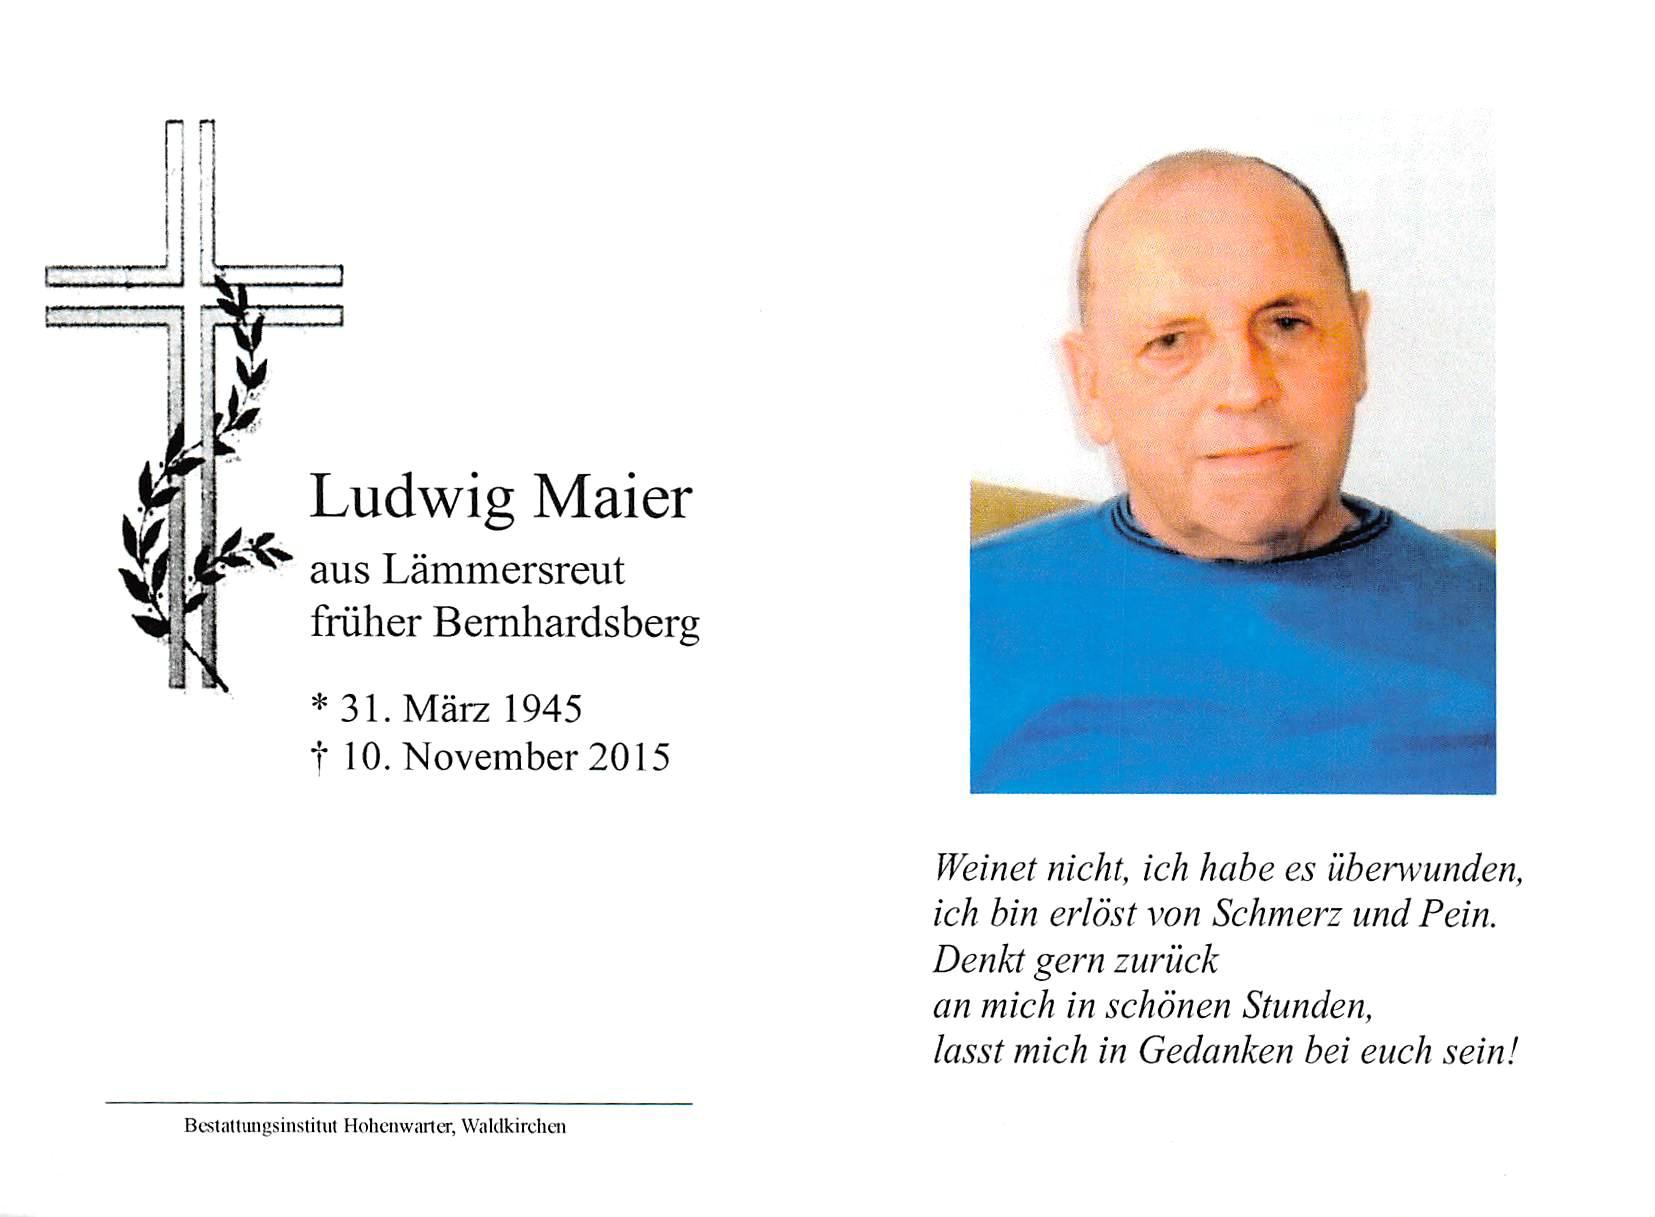 2015-11-10-Maier-Ludwig-Bernhardsberg